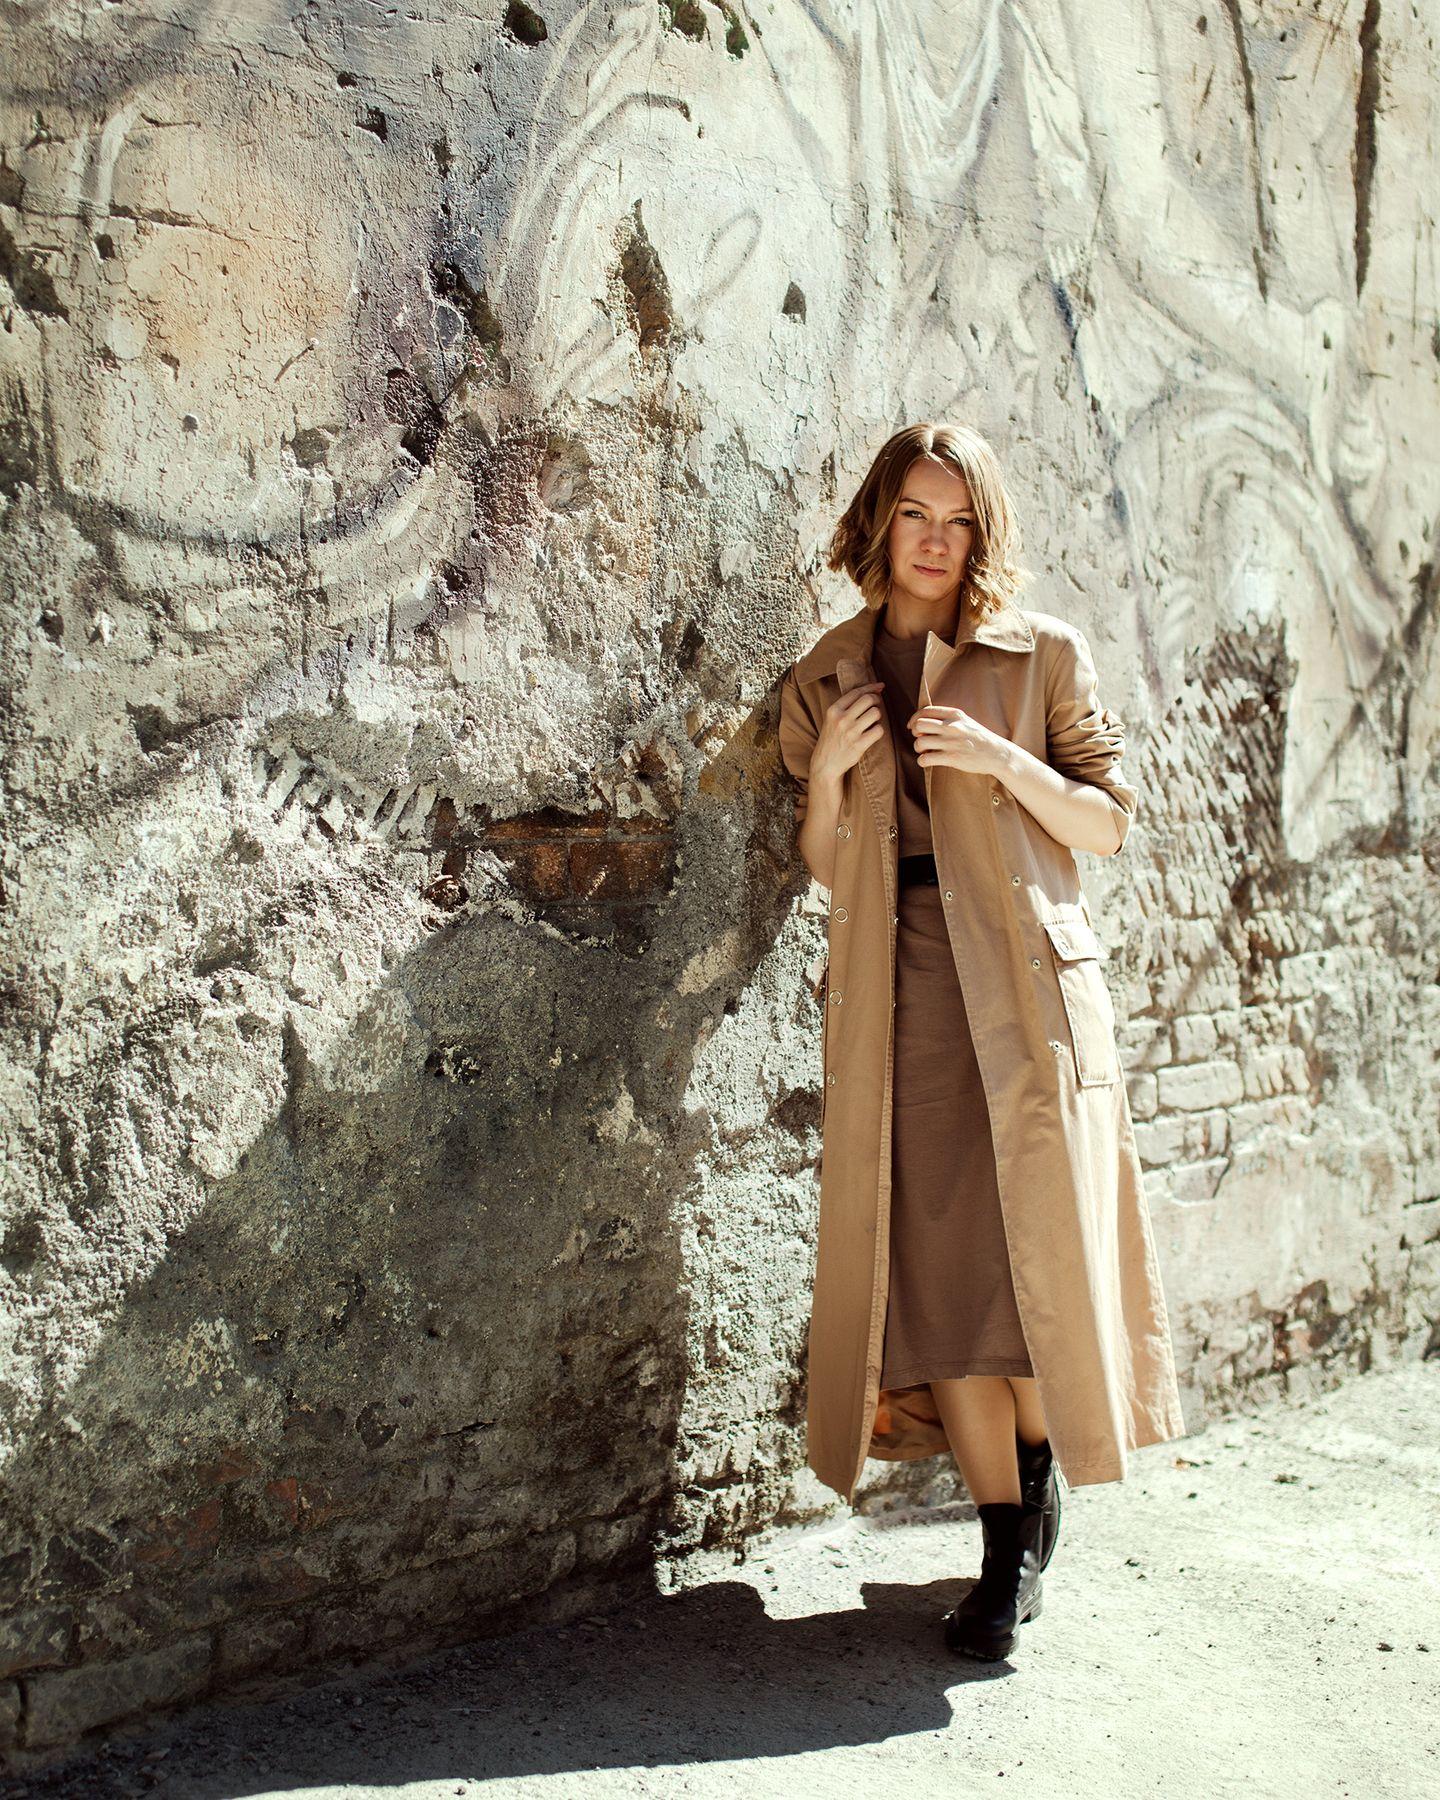 Alexandra портрет стена текстура девушка 50мм